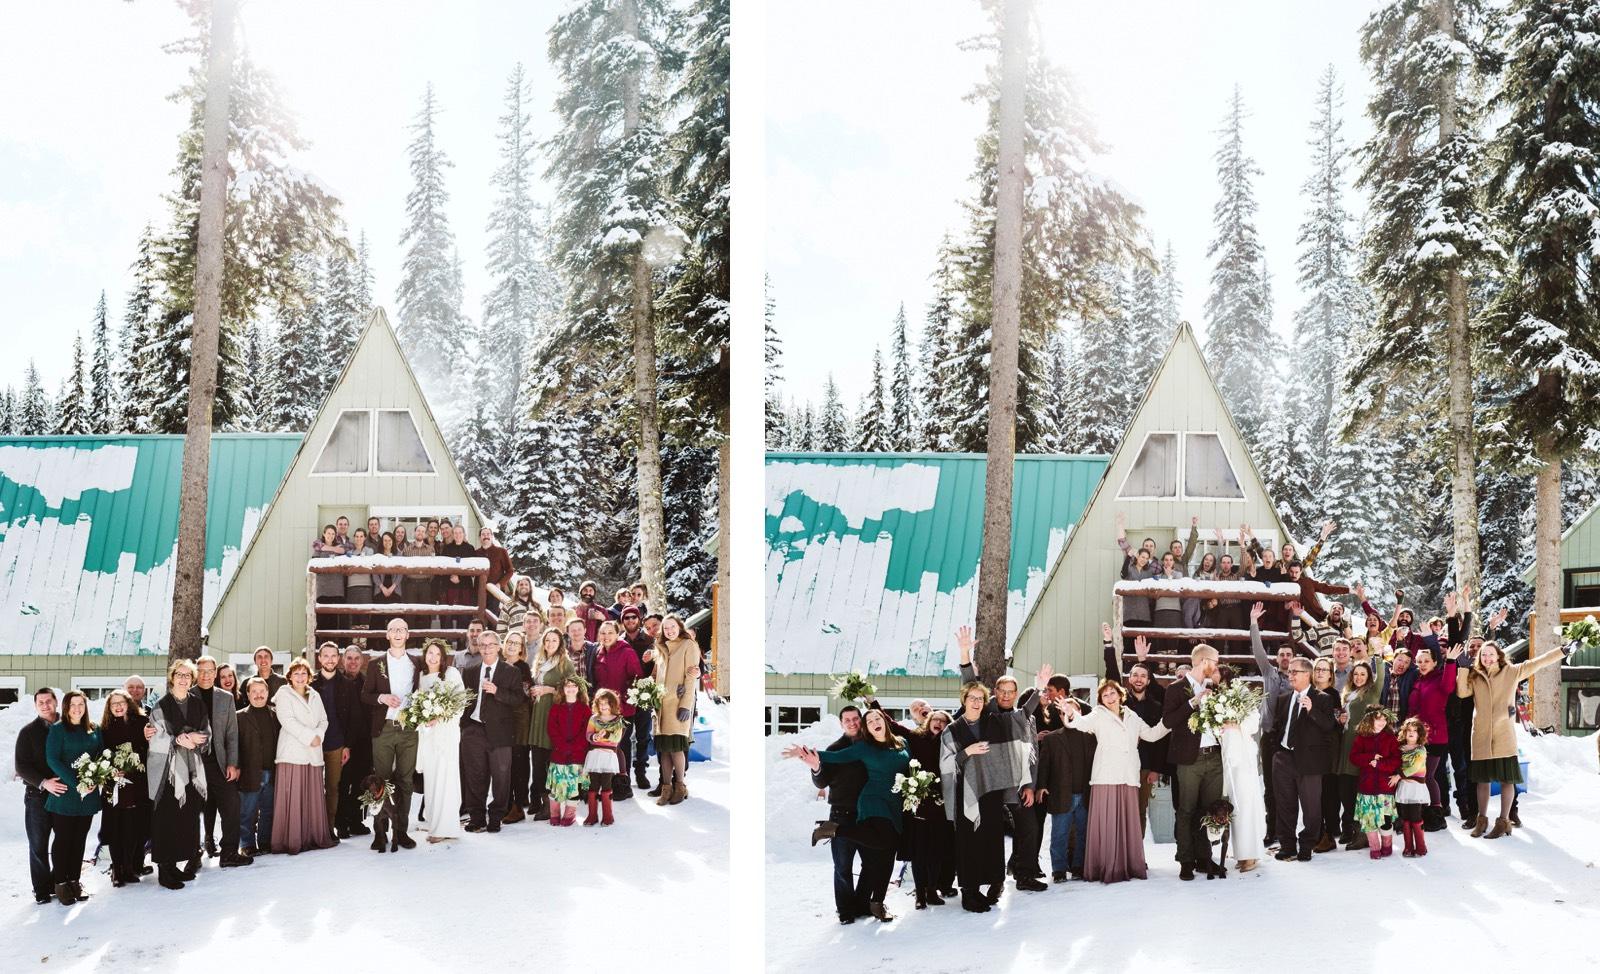 alpine-lakes-high-camp-winter-wedding-43 ALPINE LAKES HIGH CAMP WEDDING